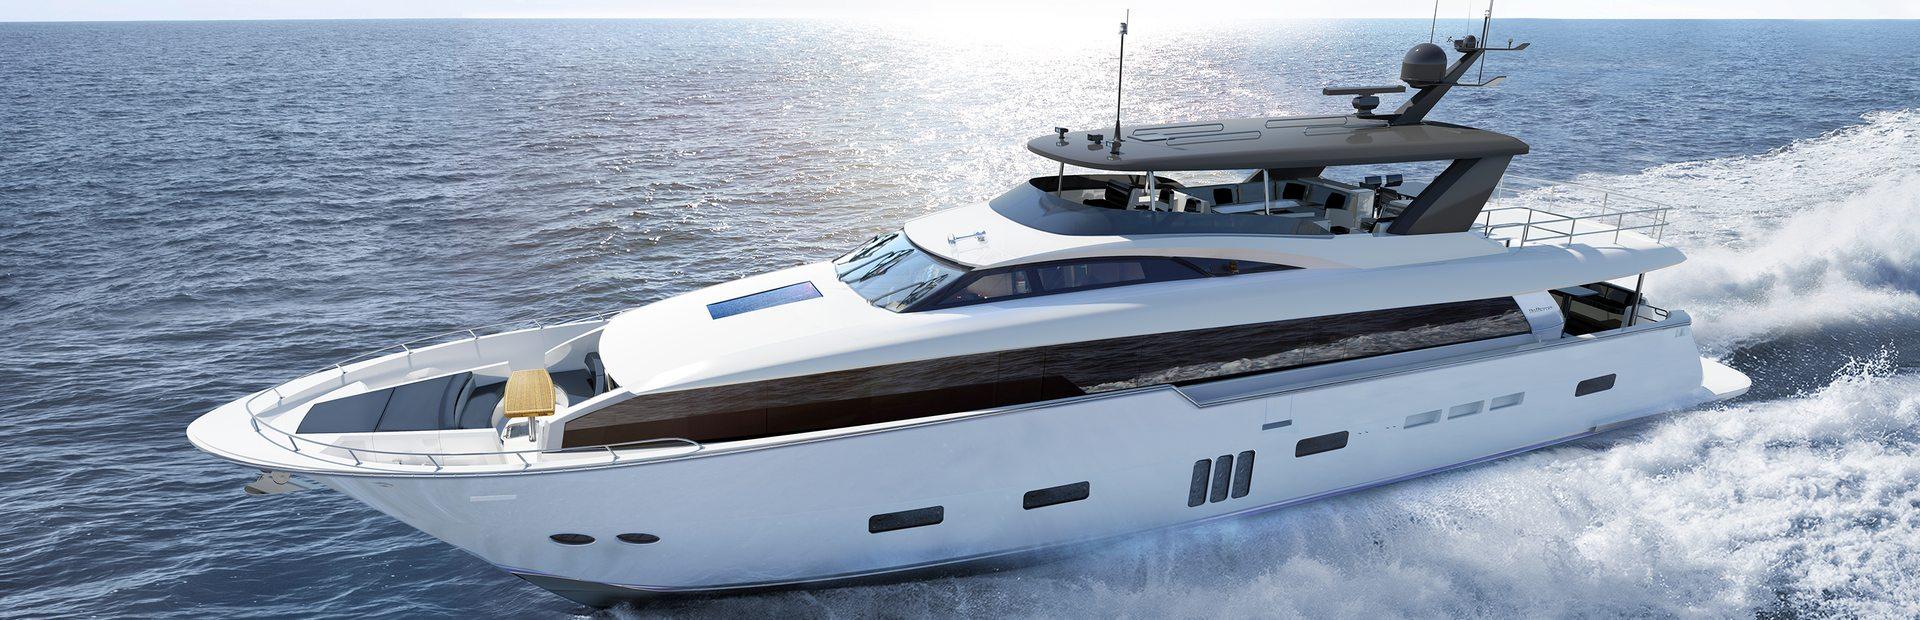 105RPH Yacht Charter